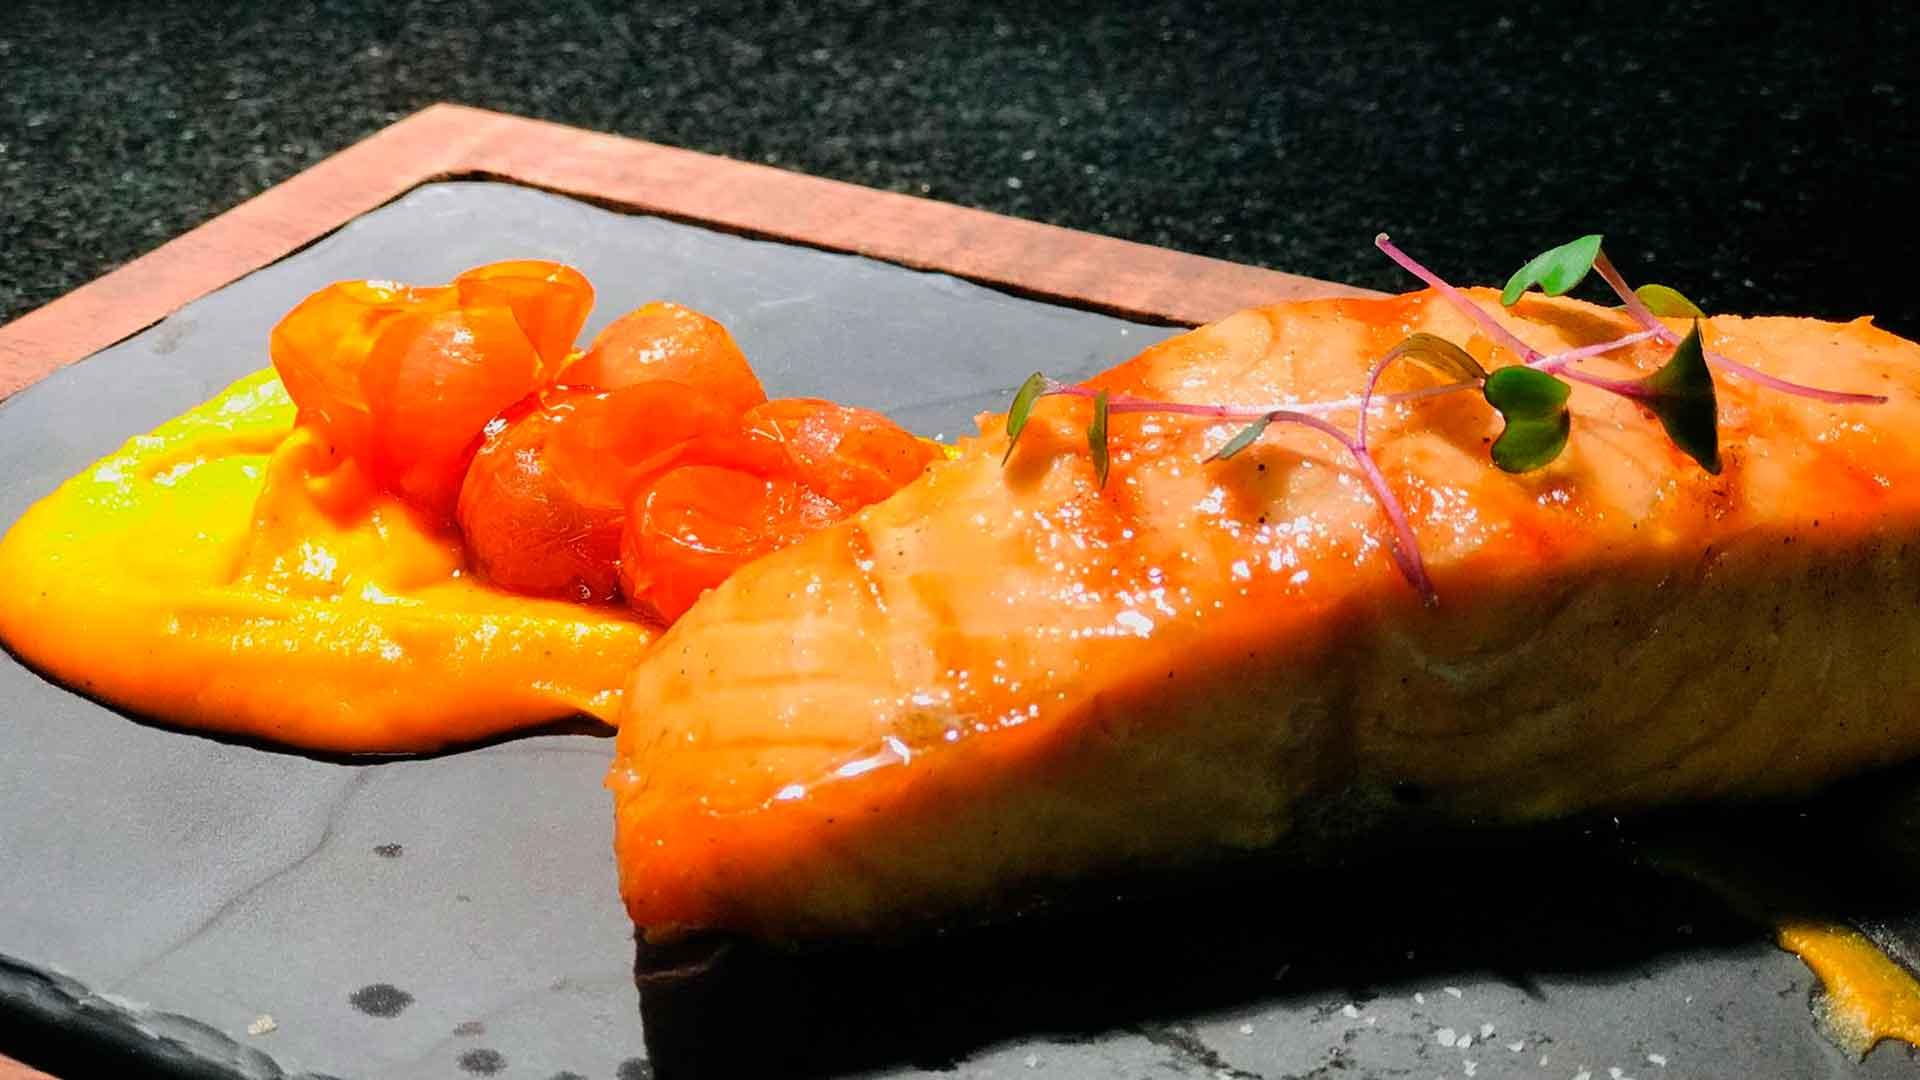 Cocina un delicioso salmón con cremoso de camote